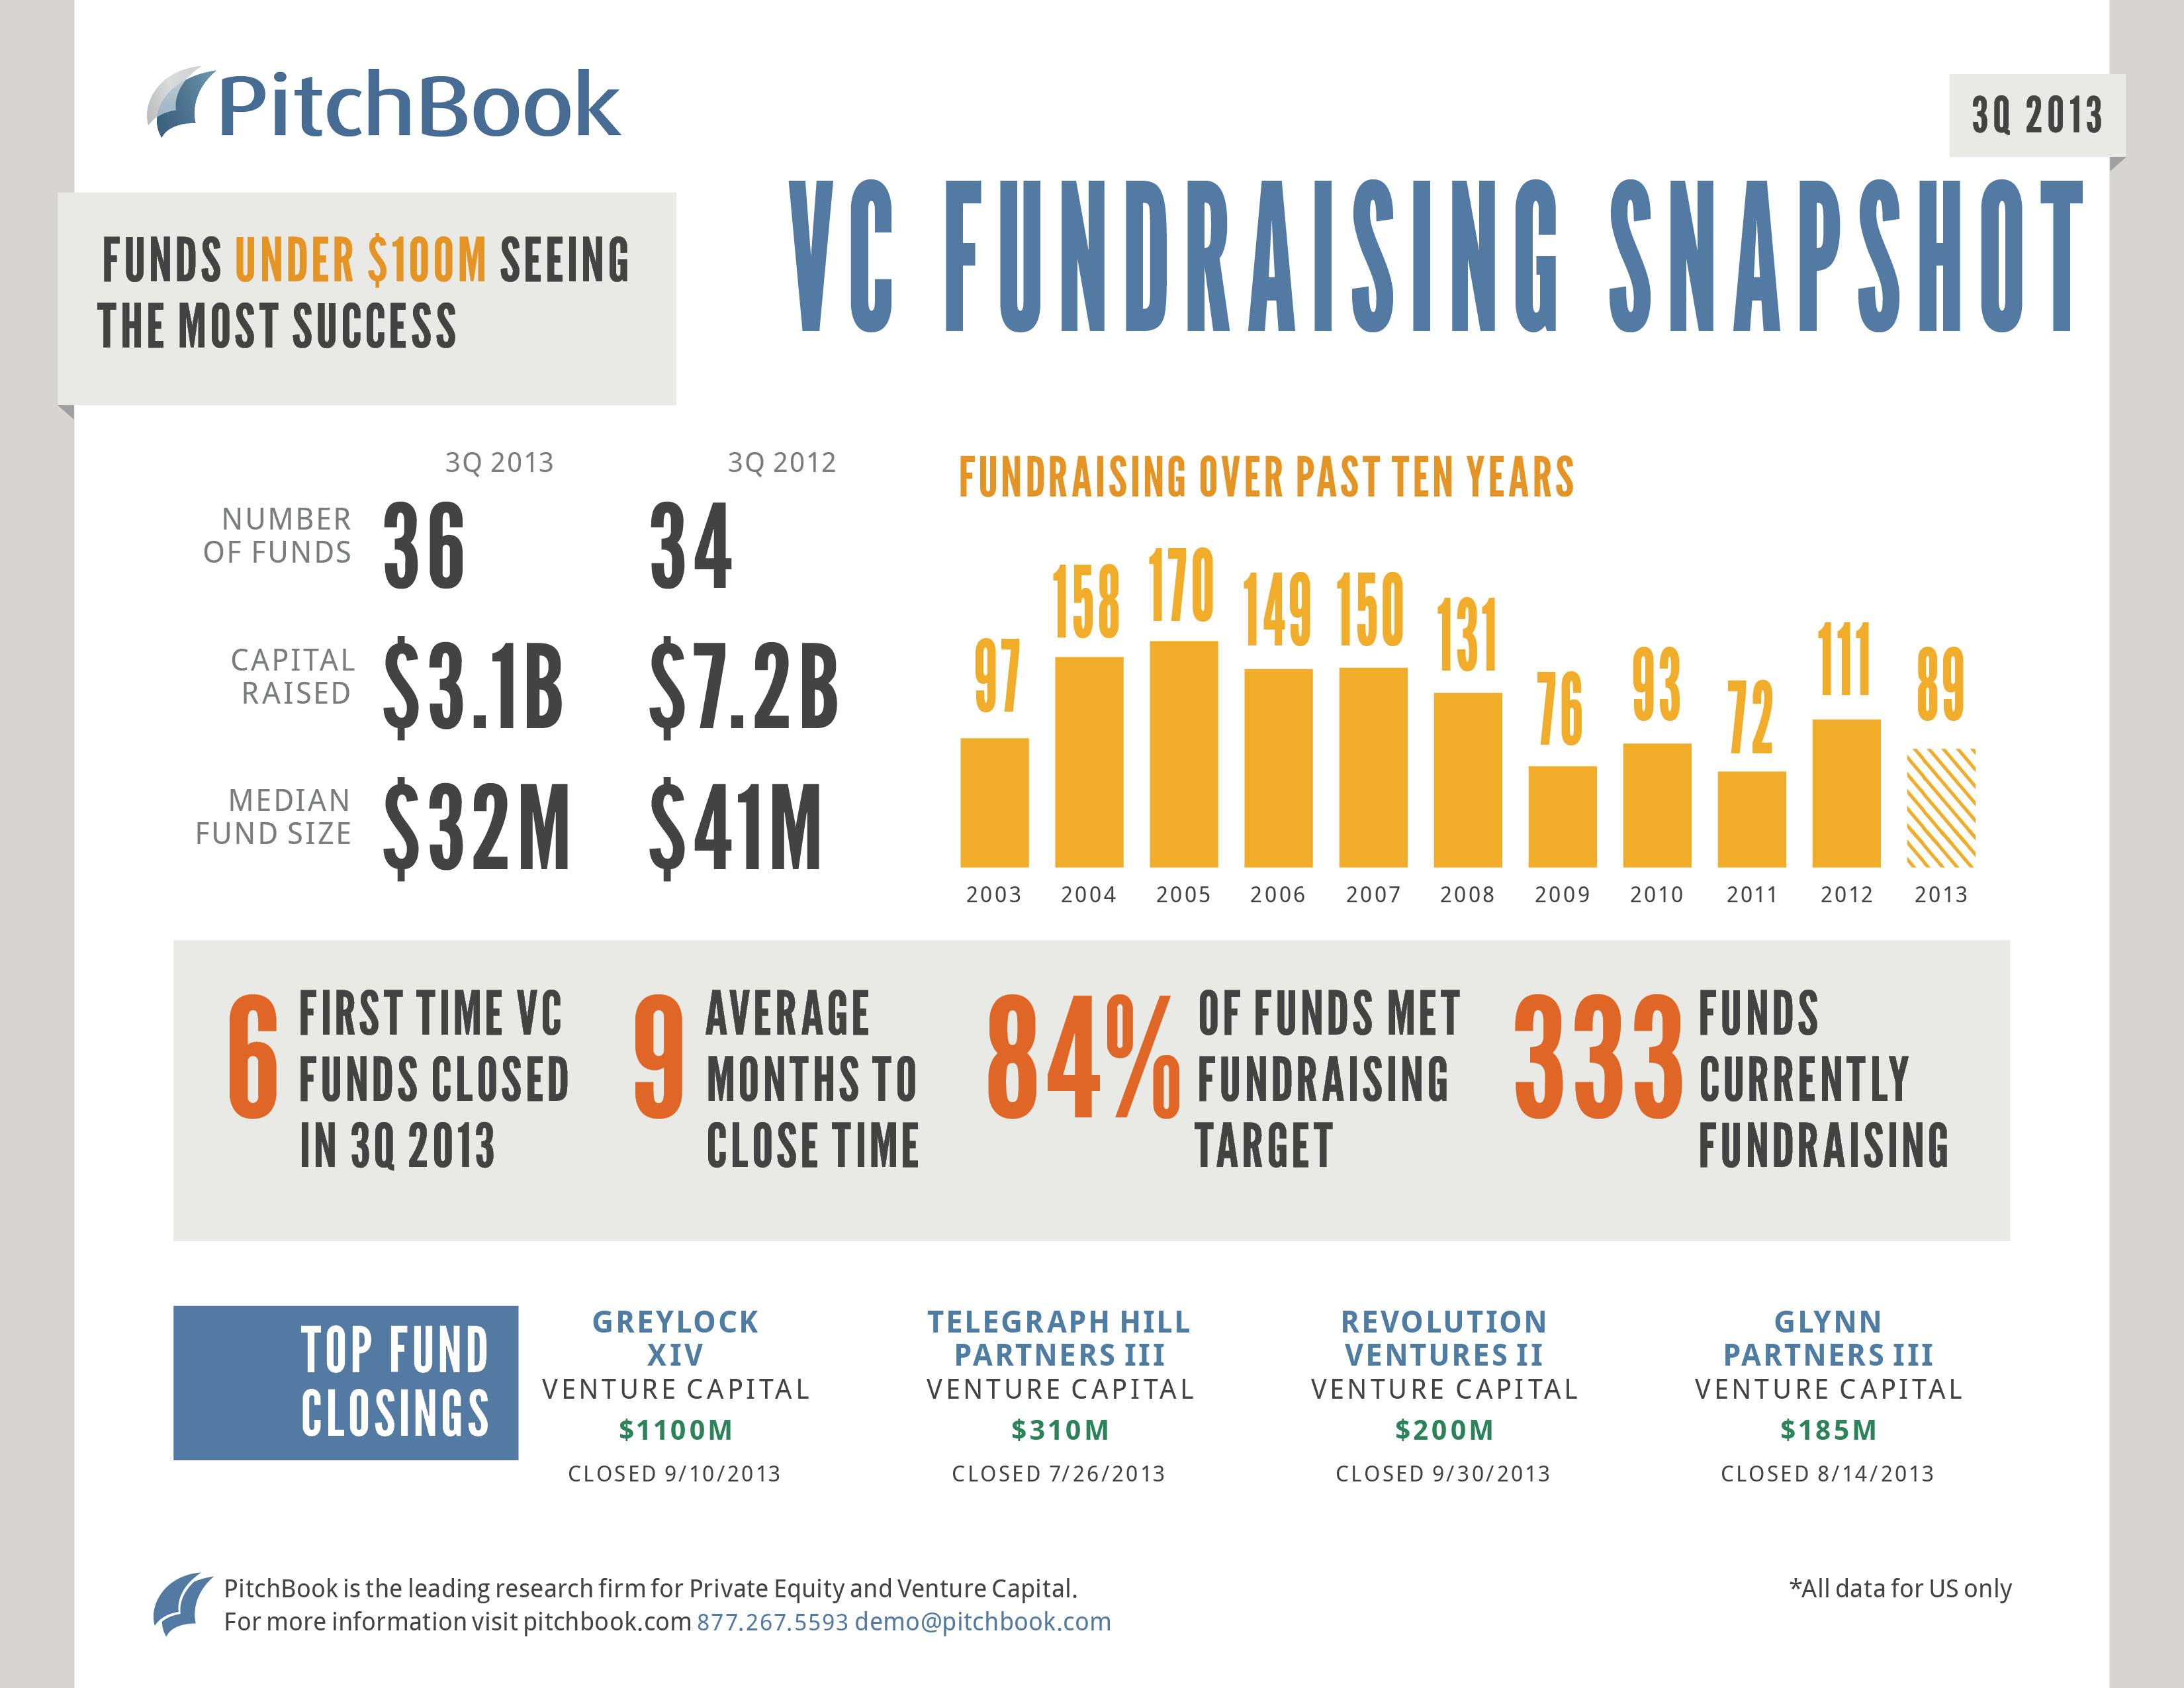 Q3 2013 VC Fundraising Snapshot